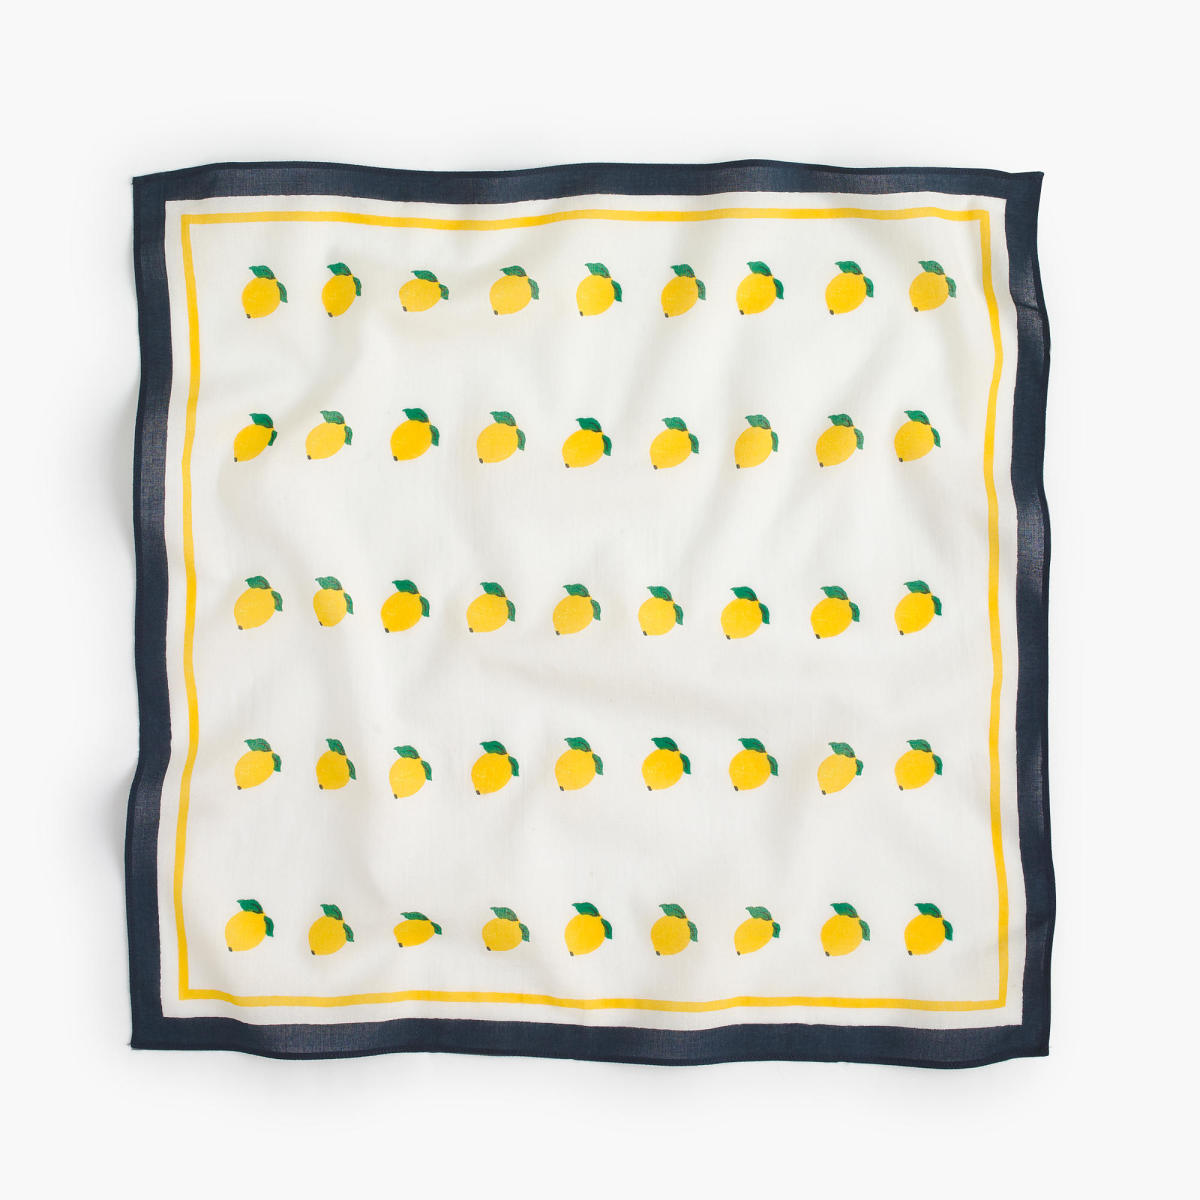 J.Crew Lemon-print bandana, $12.50, available at J.Crew